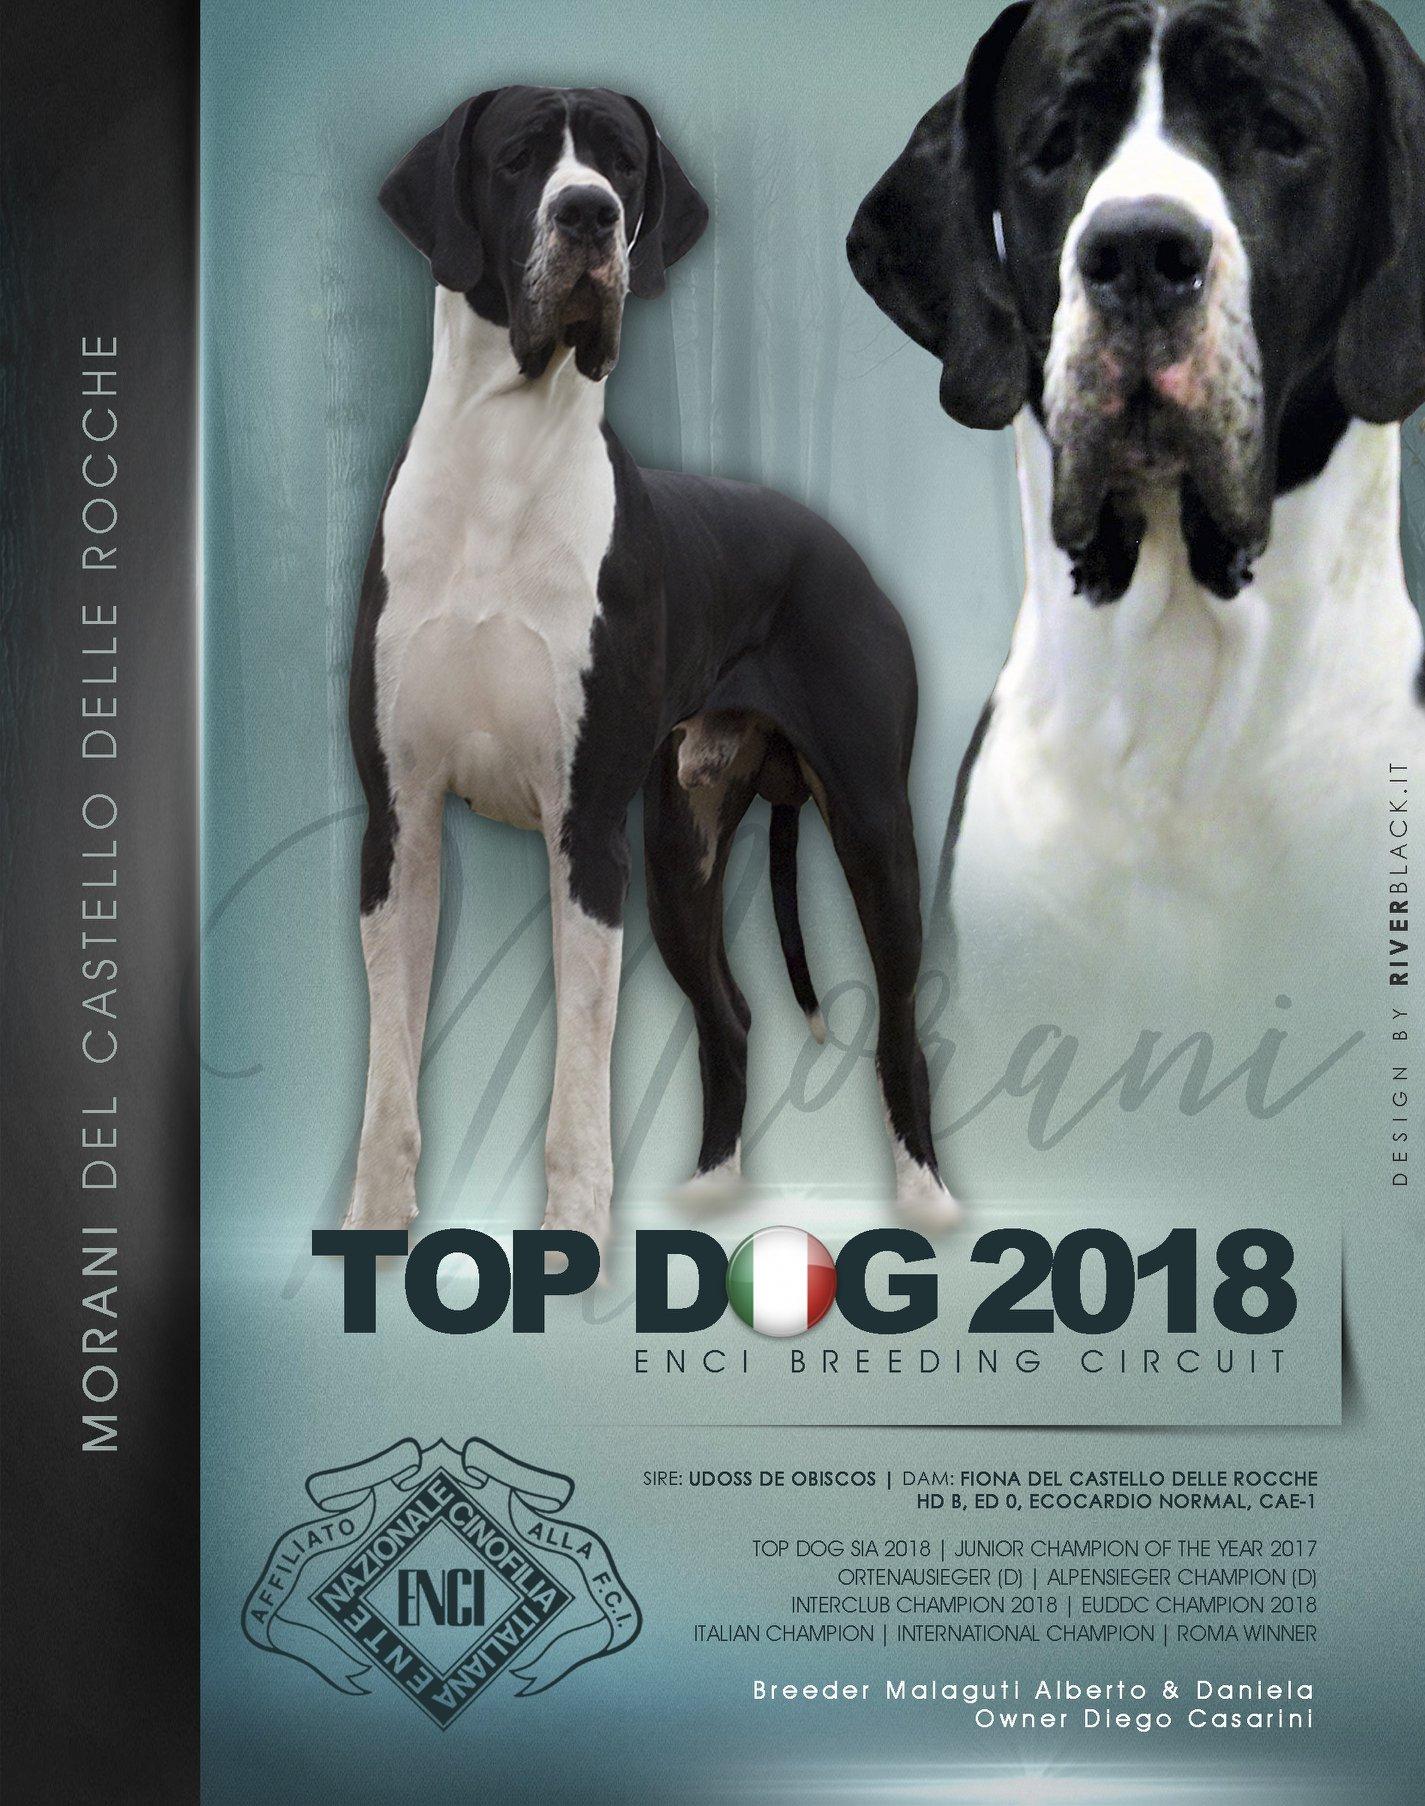 Morani DCDR Top Dog 2018